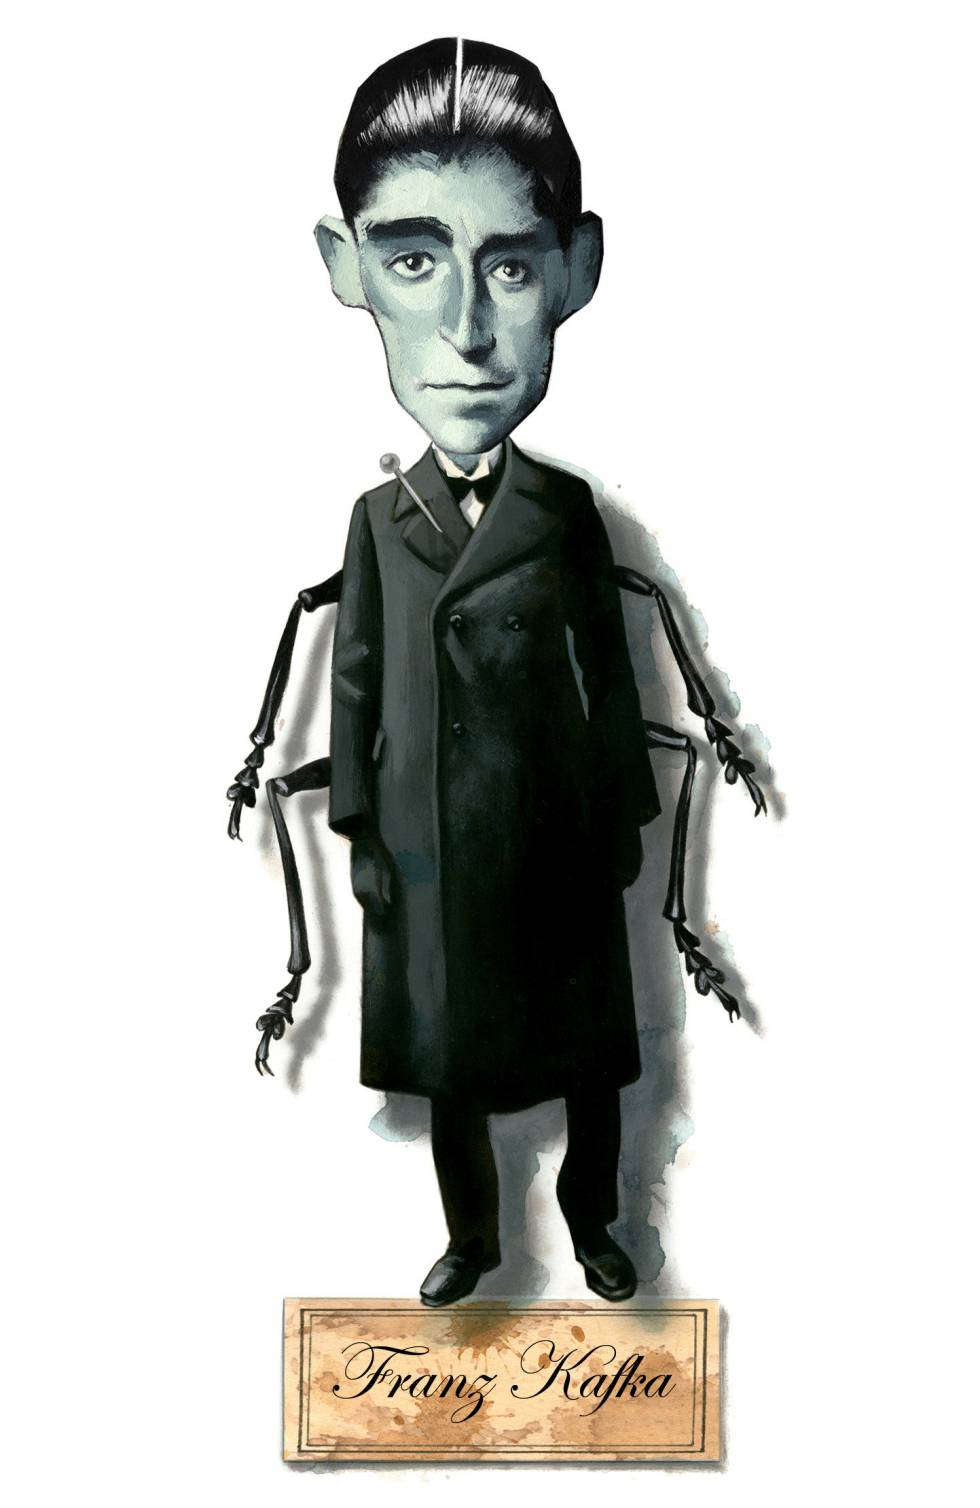 A tumba de Kafka